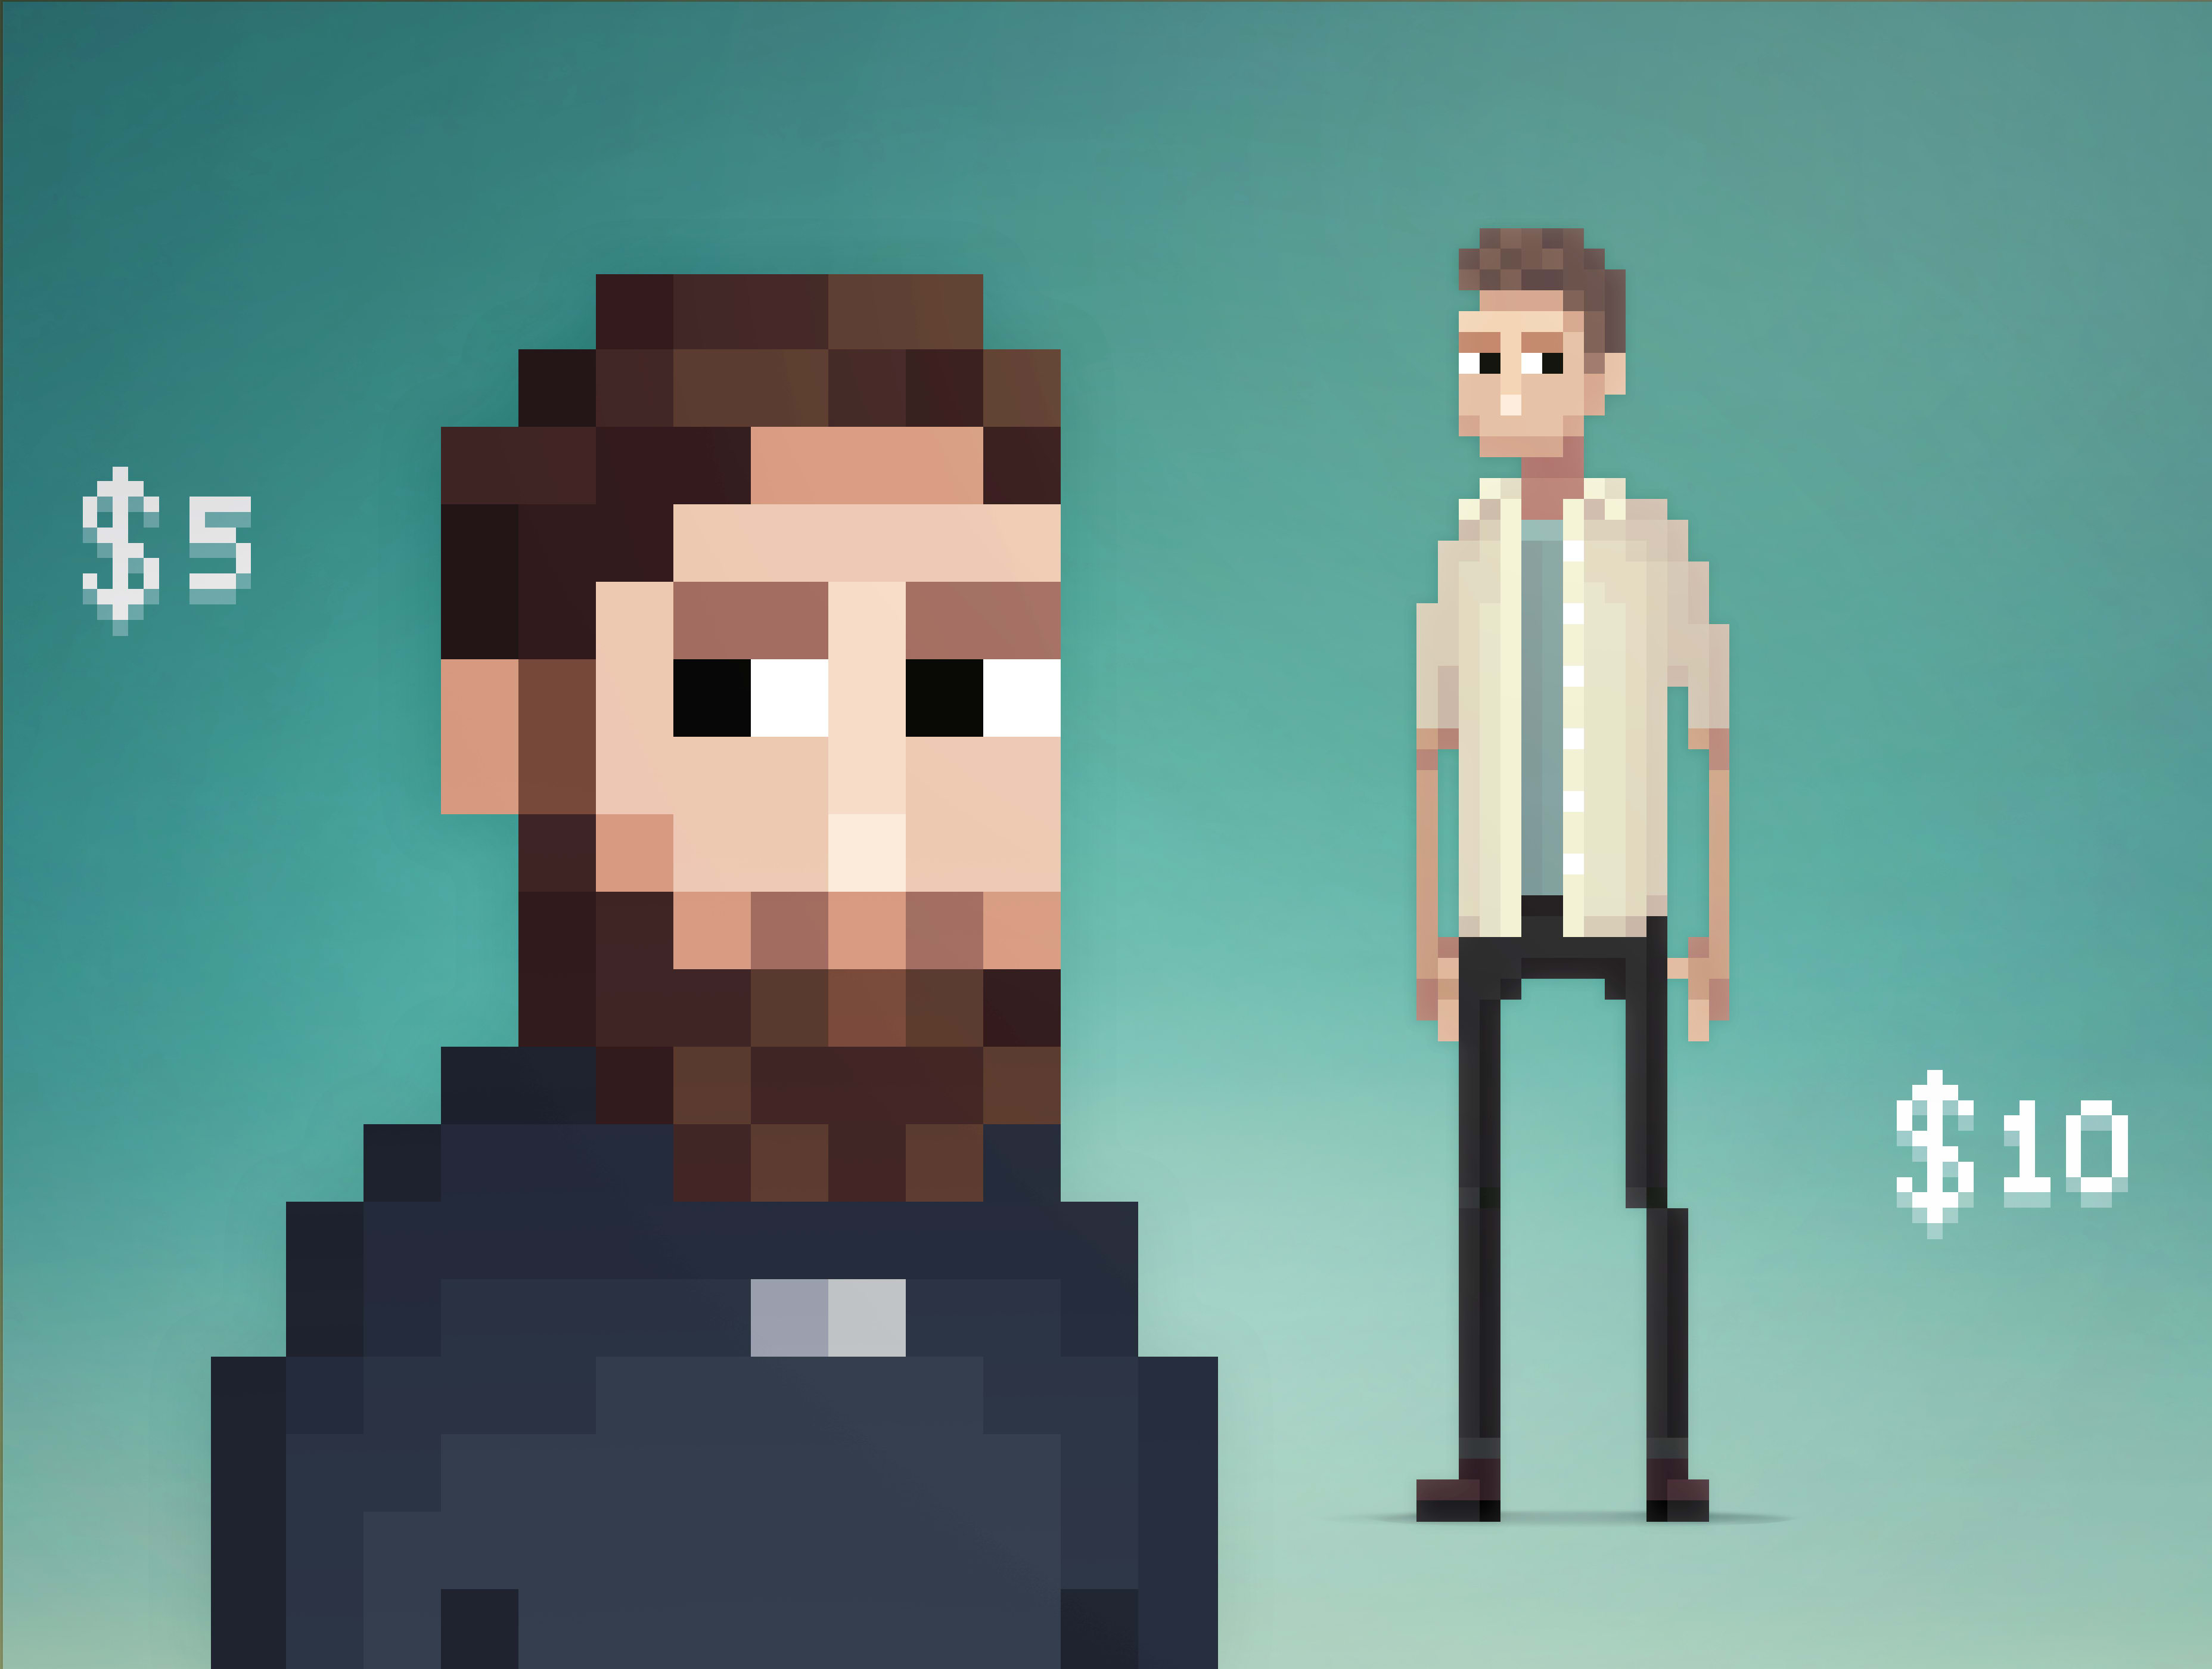 Make Pixel Art Portraits In My Pixelart Style By Leeoccleshaw